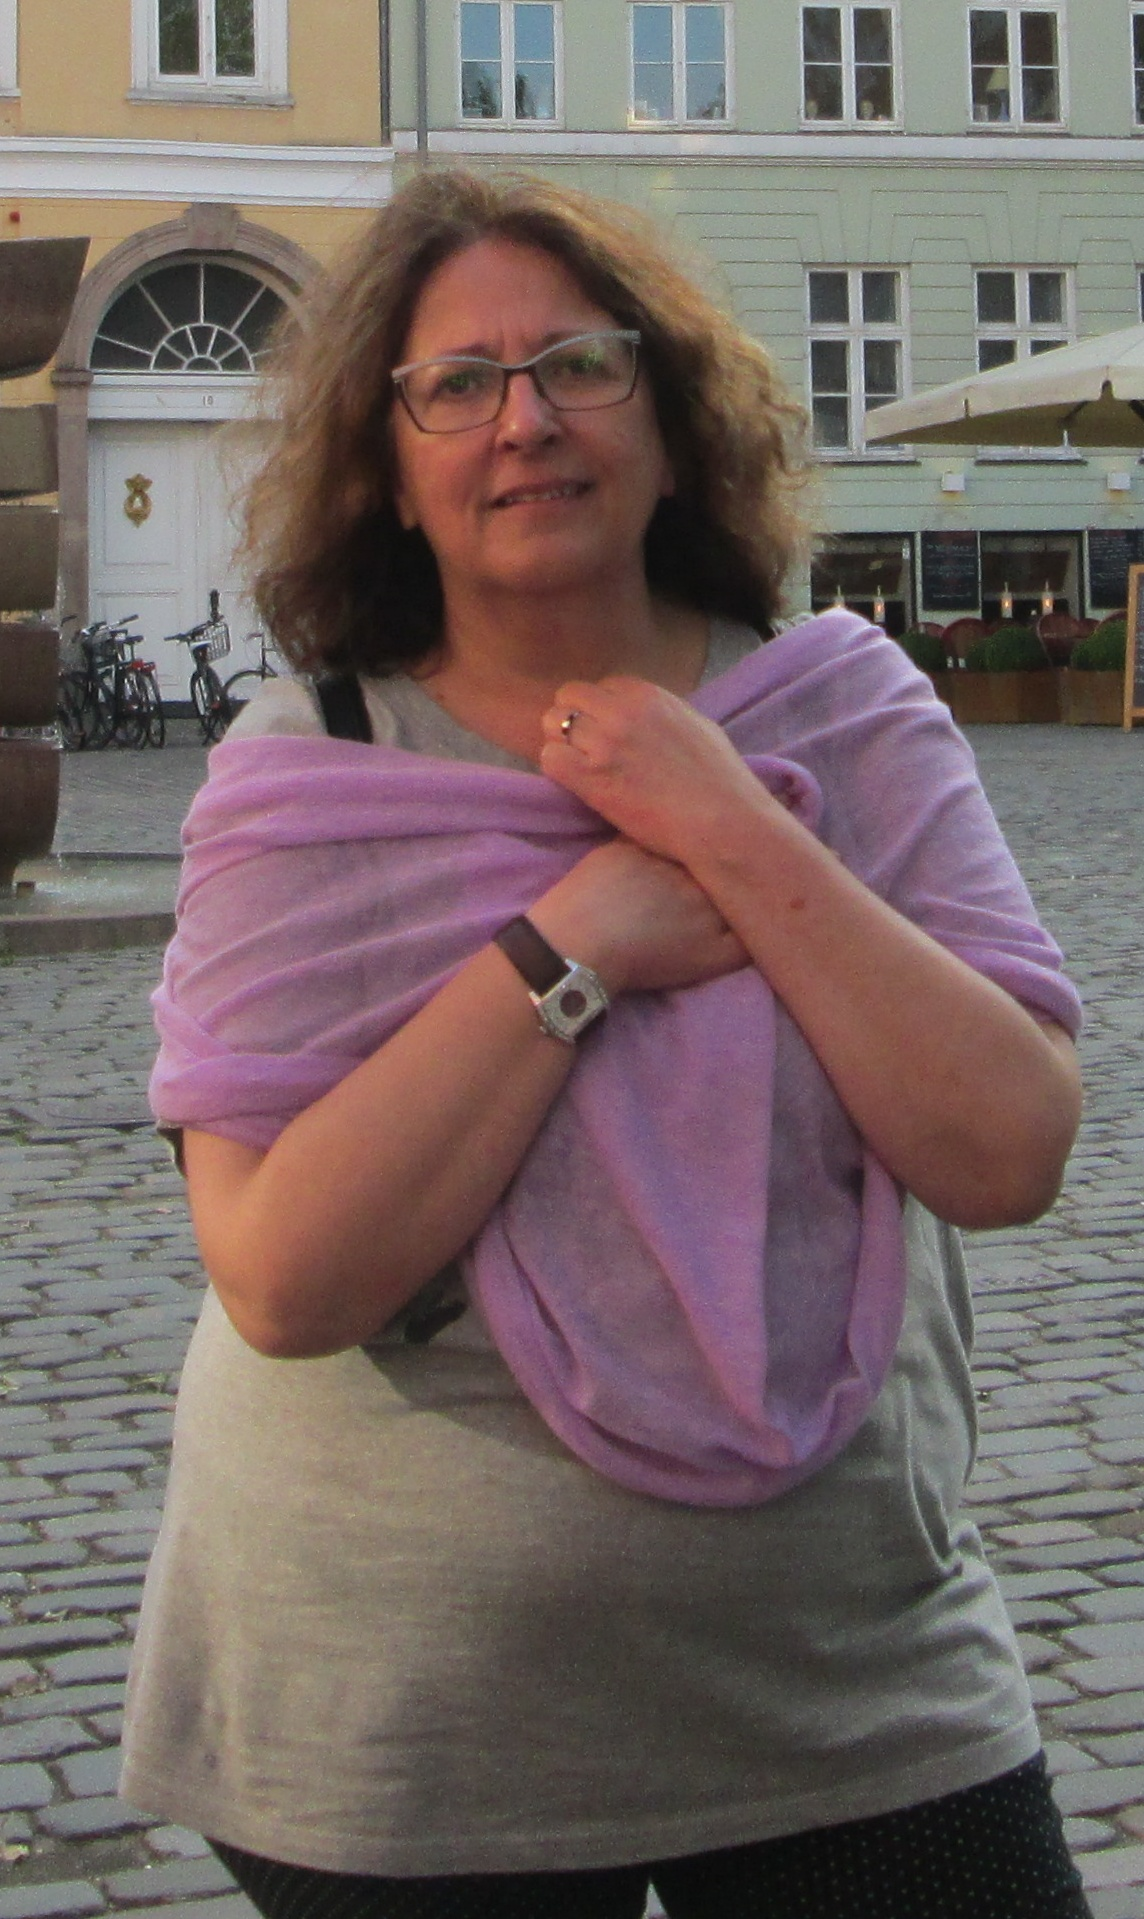 Isabel Quintairos, integrante de Saúde Mental FEAFES Galicia